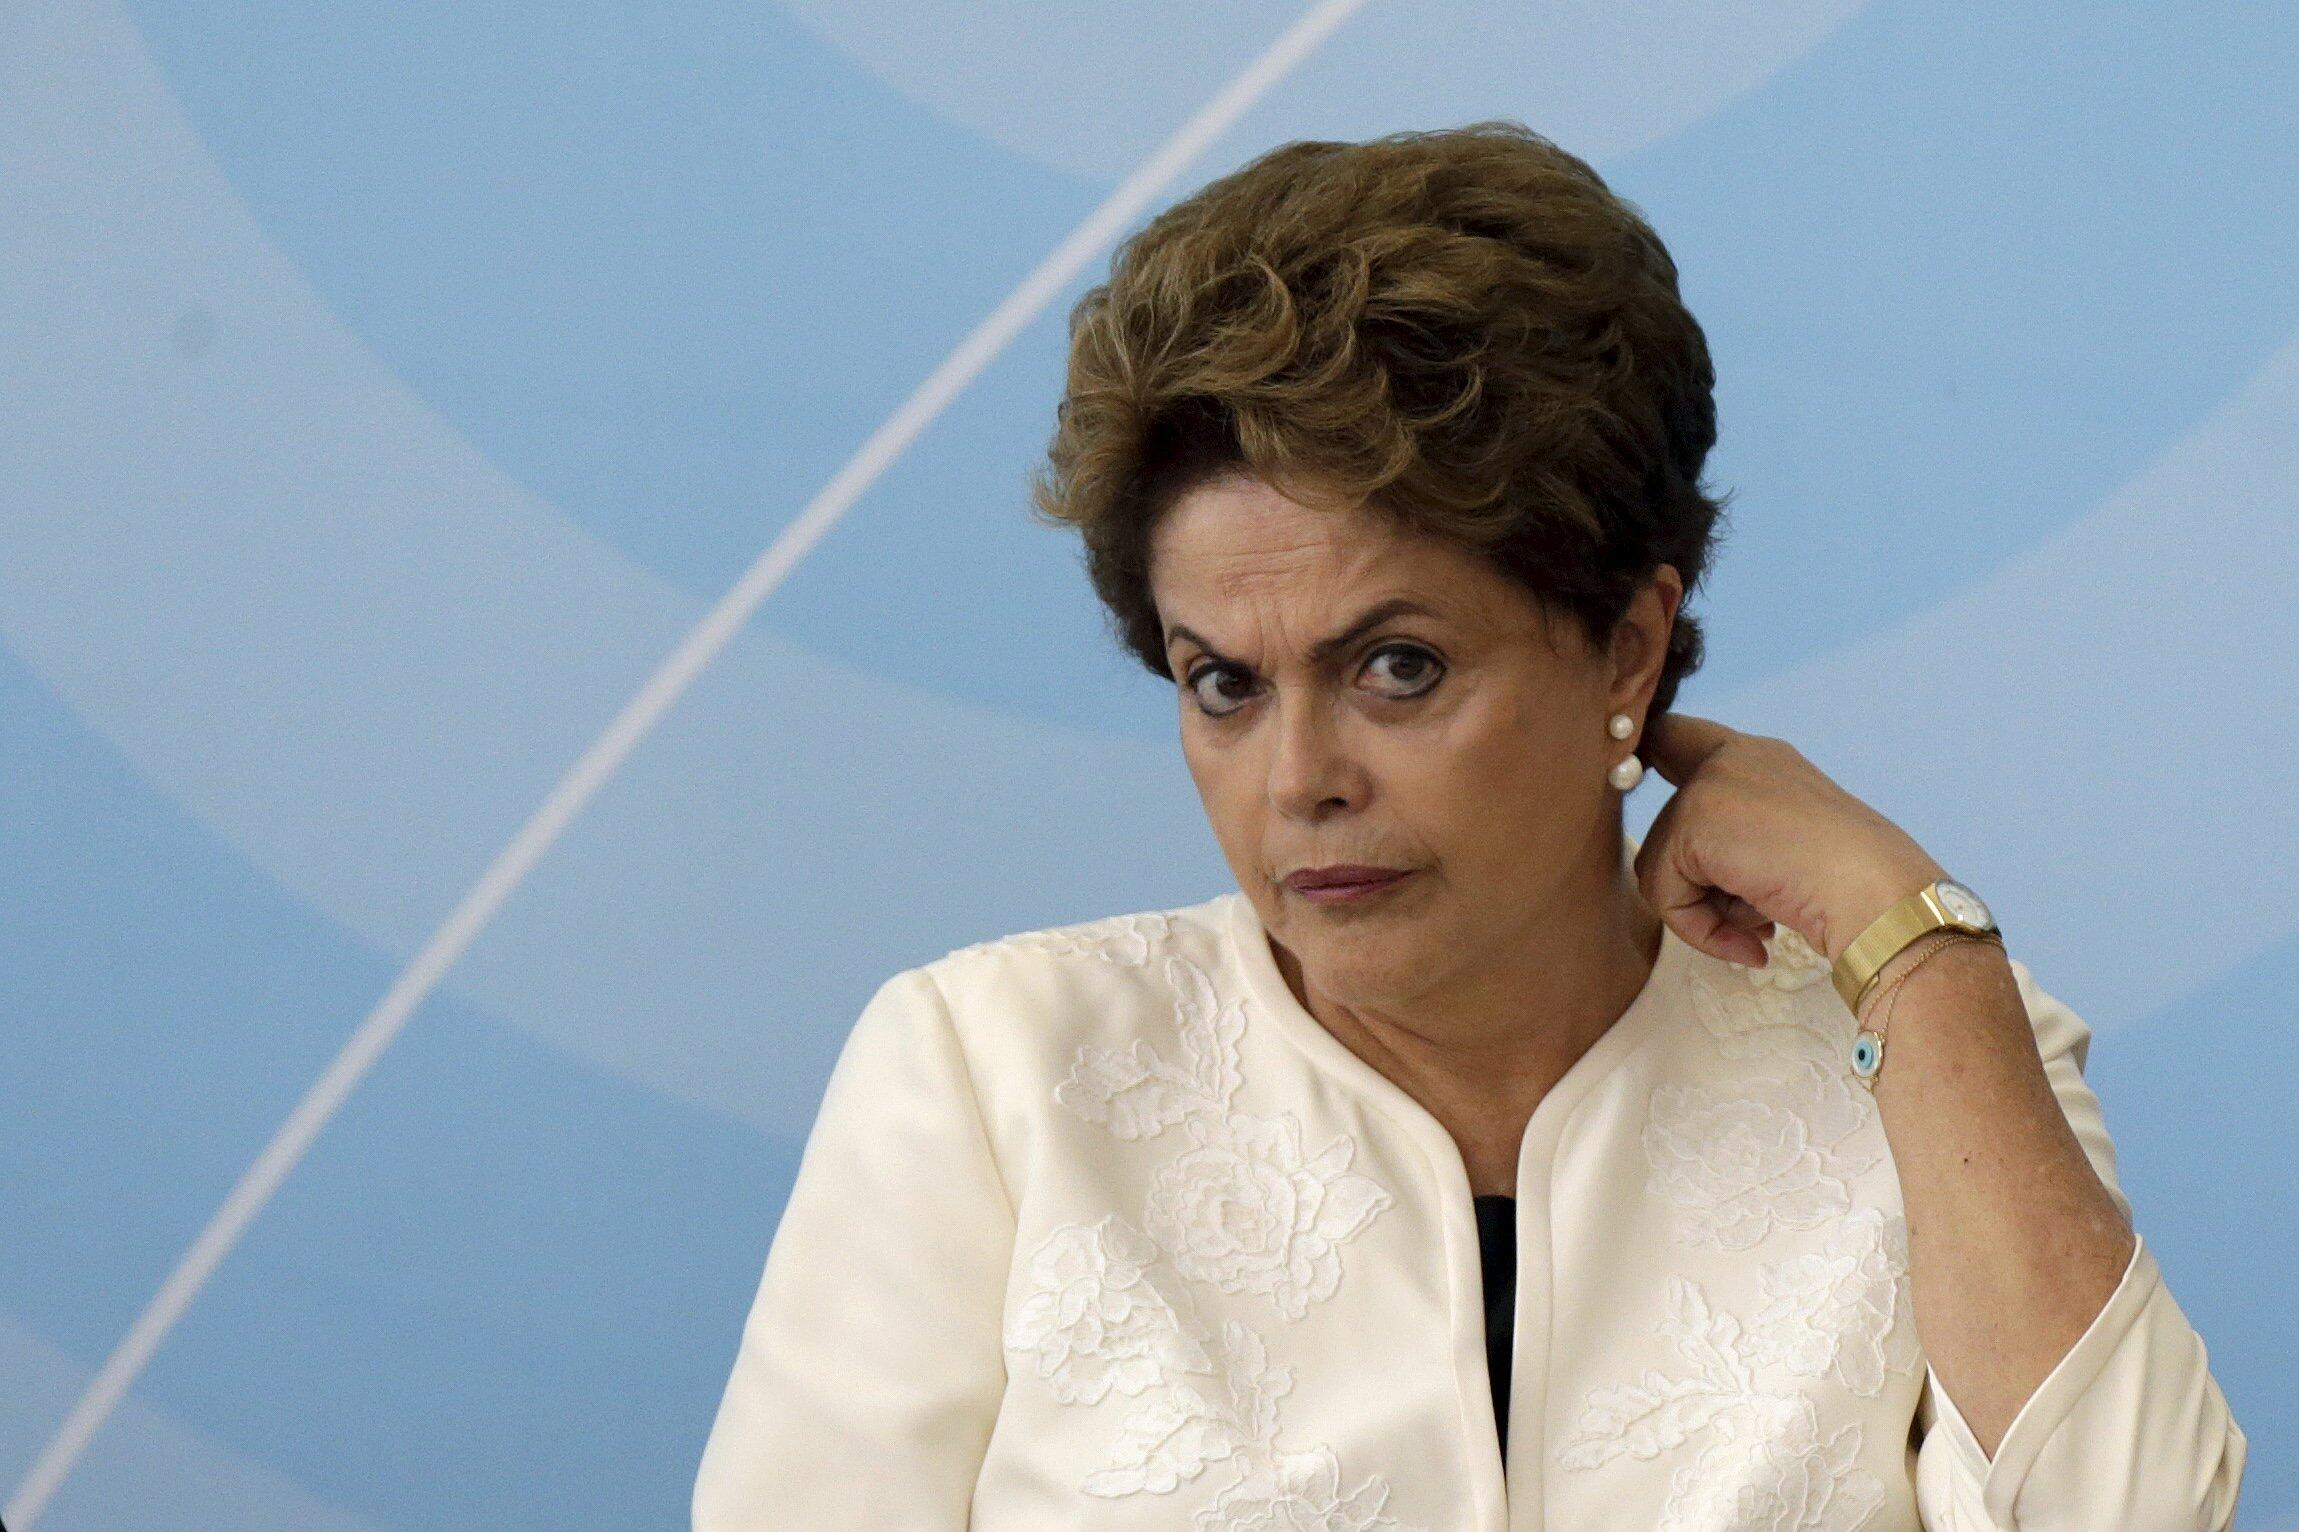 A presidente do Brasil, Dilma Rousseff, desembarcou em Paris neste sábado, 28 de novembro de 2015.